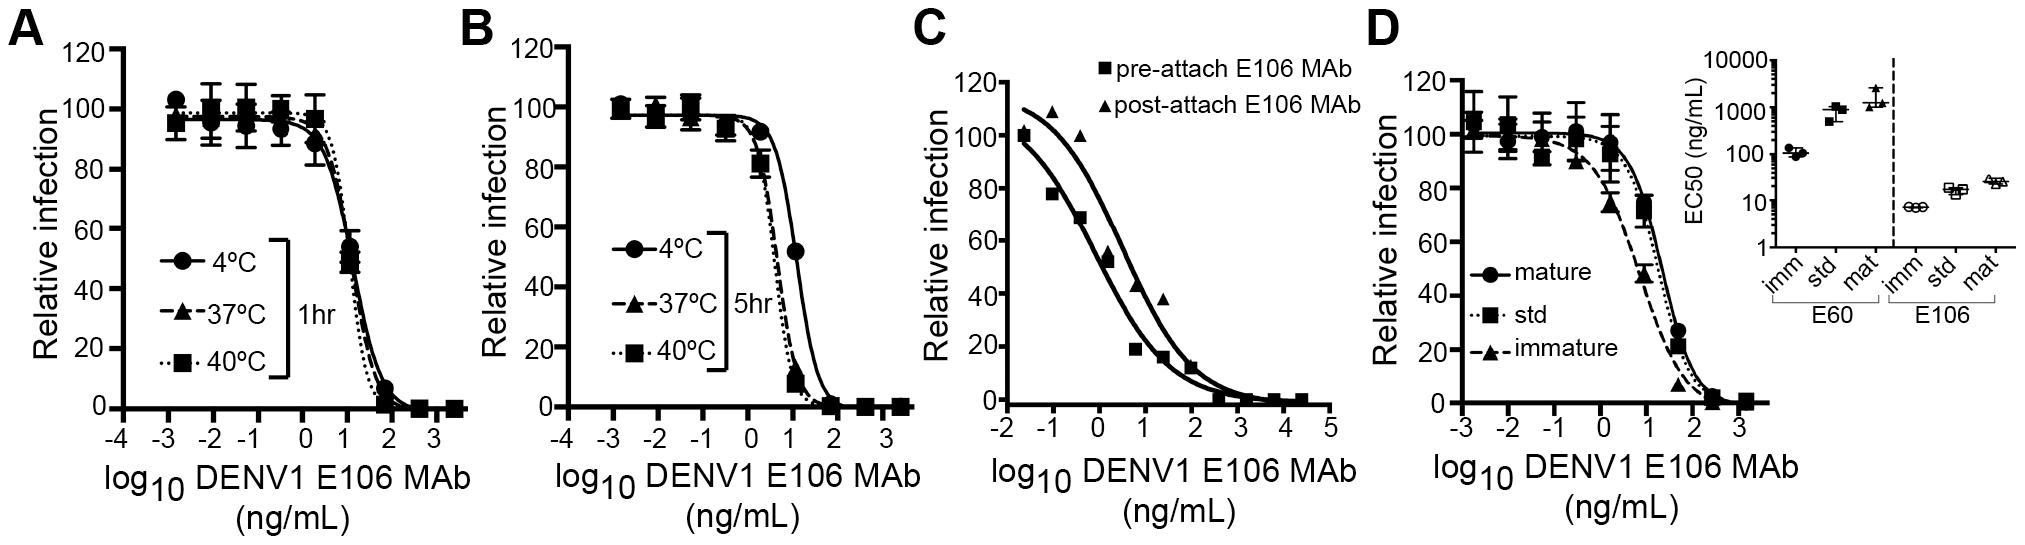 Functional characteristics of neutralization by E106 MAb.